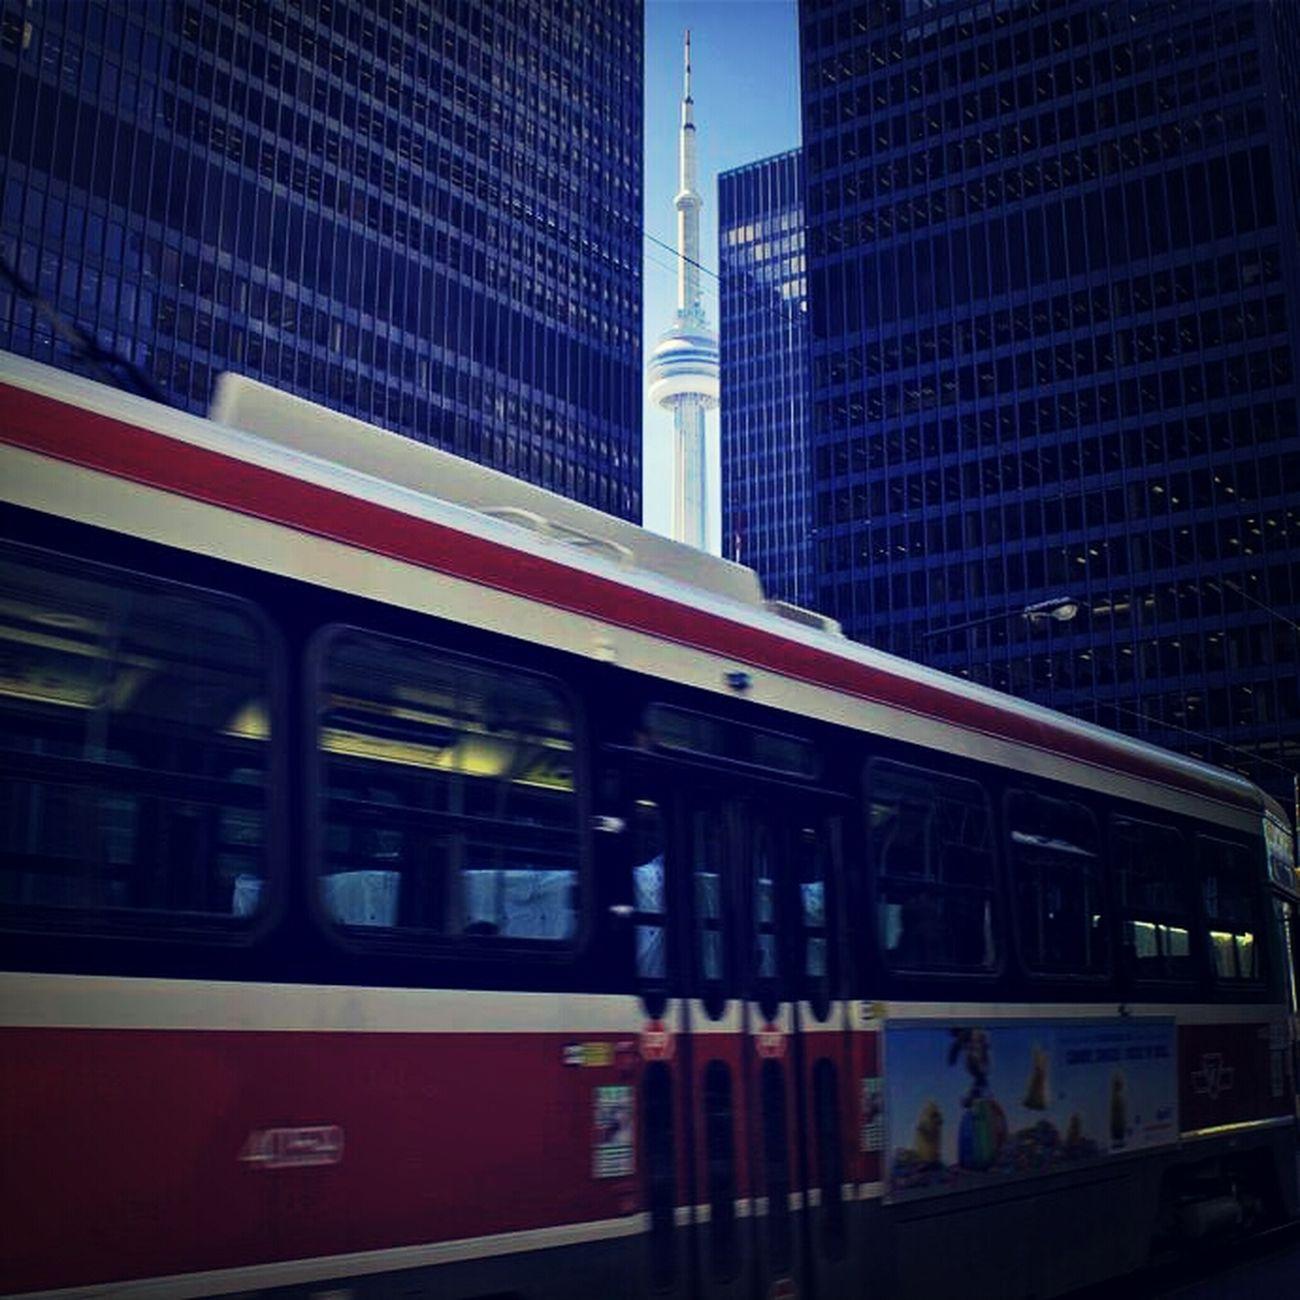 Toronto Skyscrapers Streetcar CN Tower Bay Street King Street Streetcar